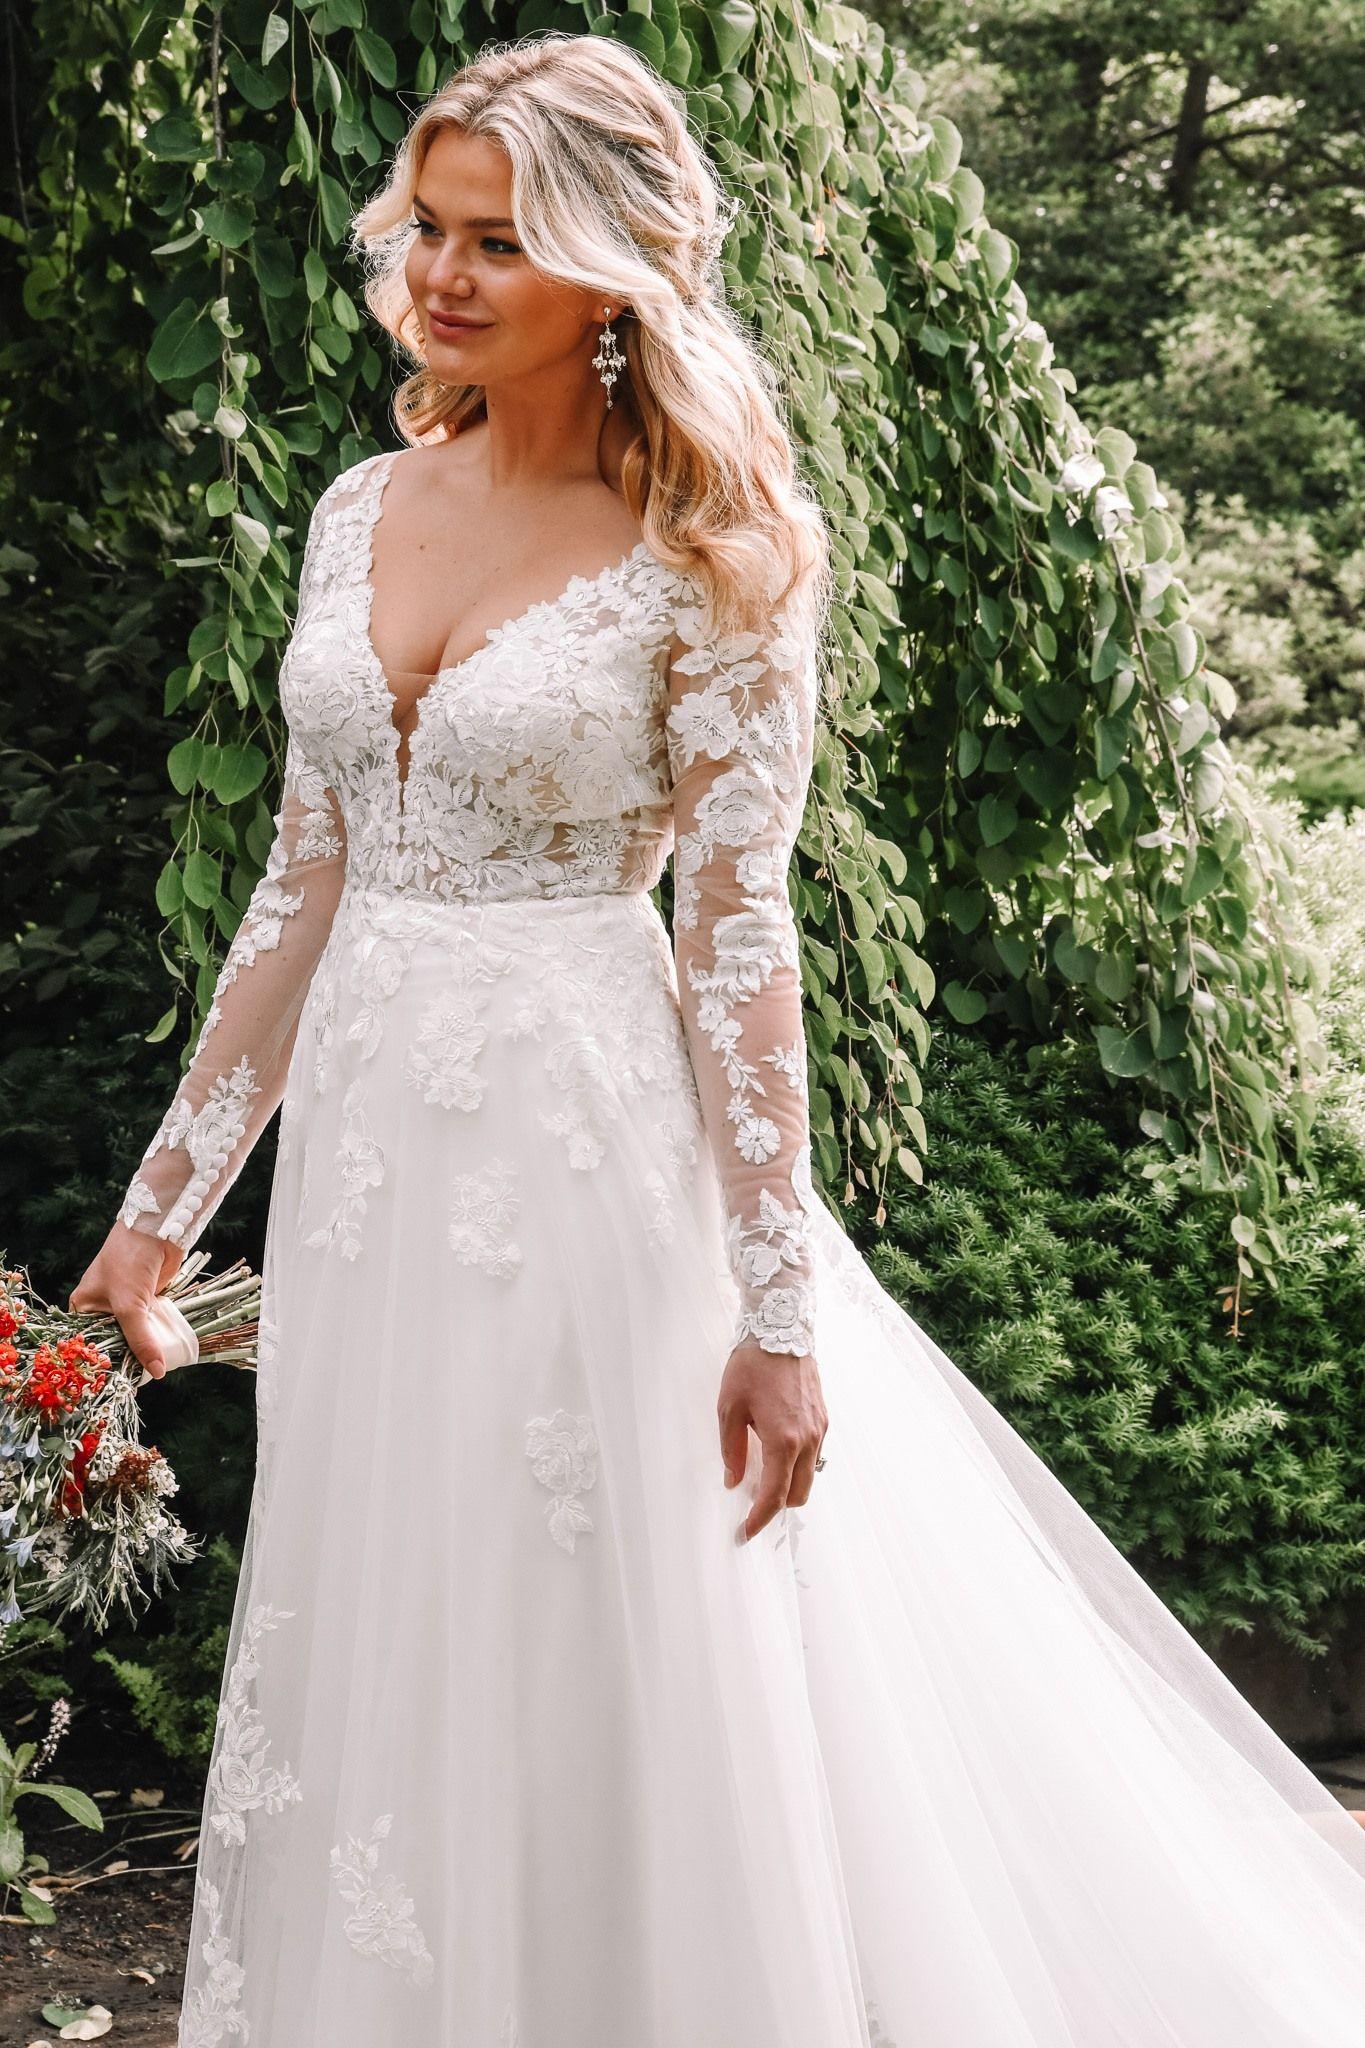 Essense Of Australia D2846 Long Sleeve Wedding Dress Lace Essense Of Australia Wedding Dresses Lace Wedding Dress With Sleeves [ 2048 x 1365 Pixel ]